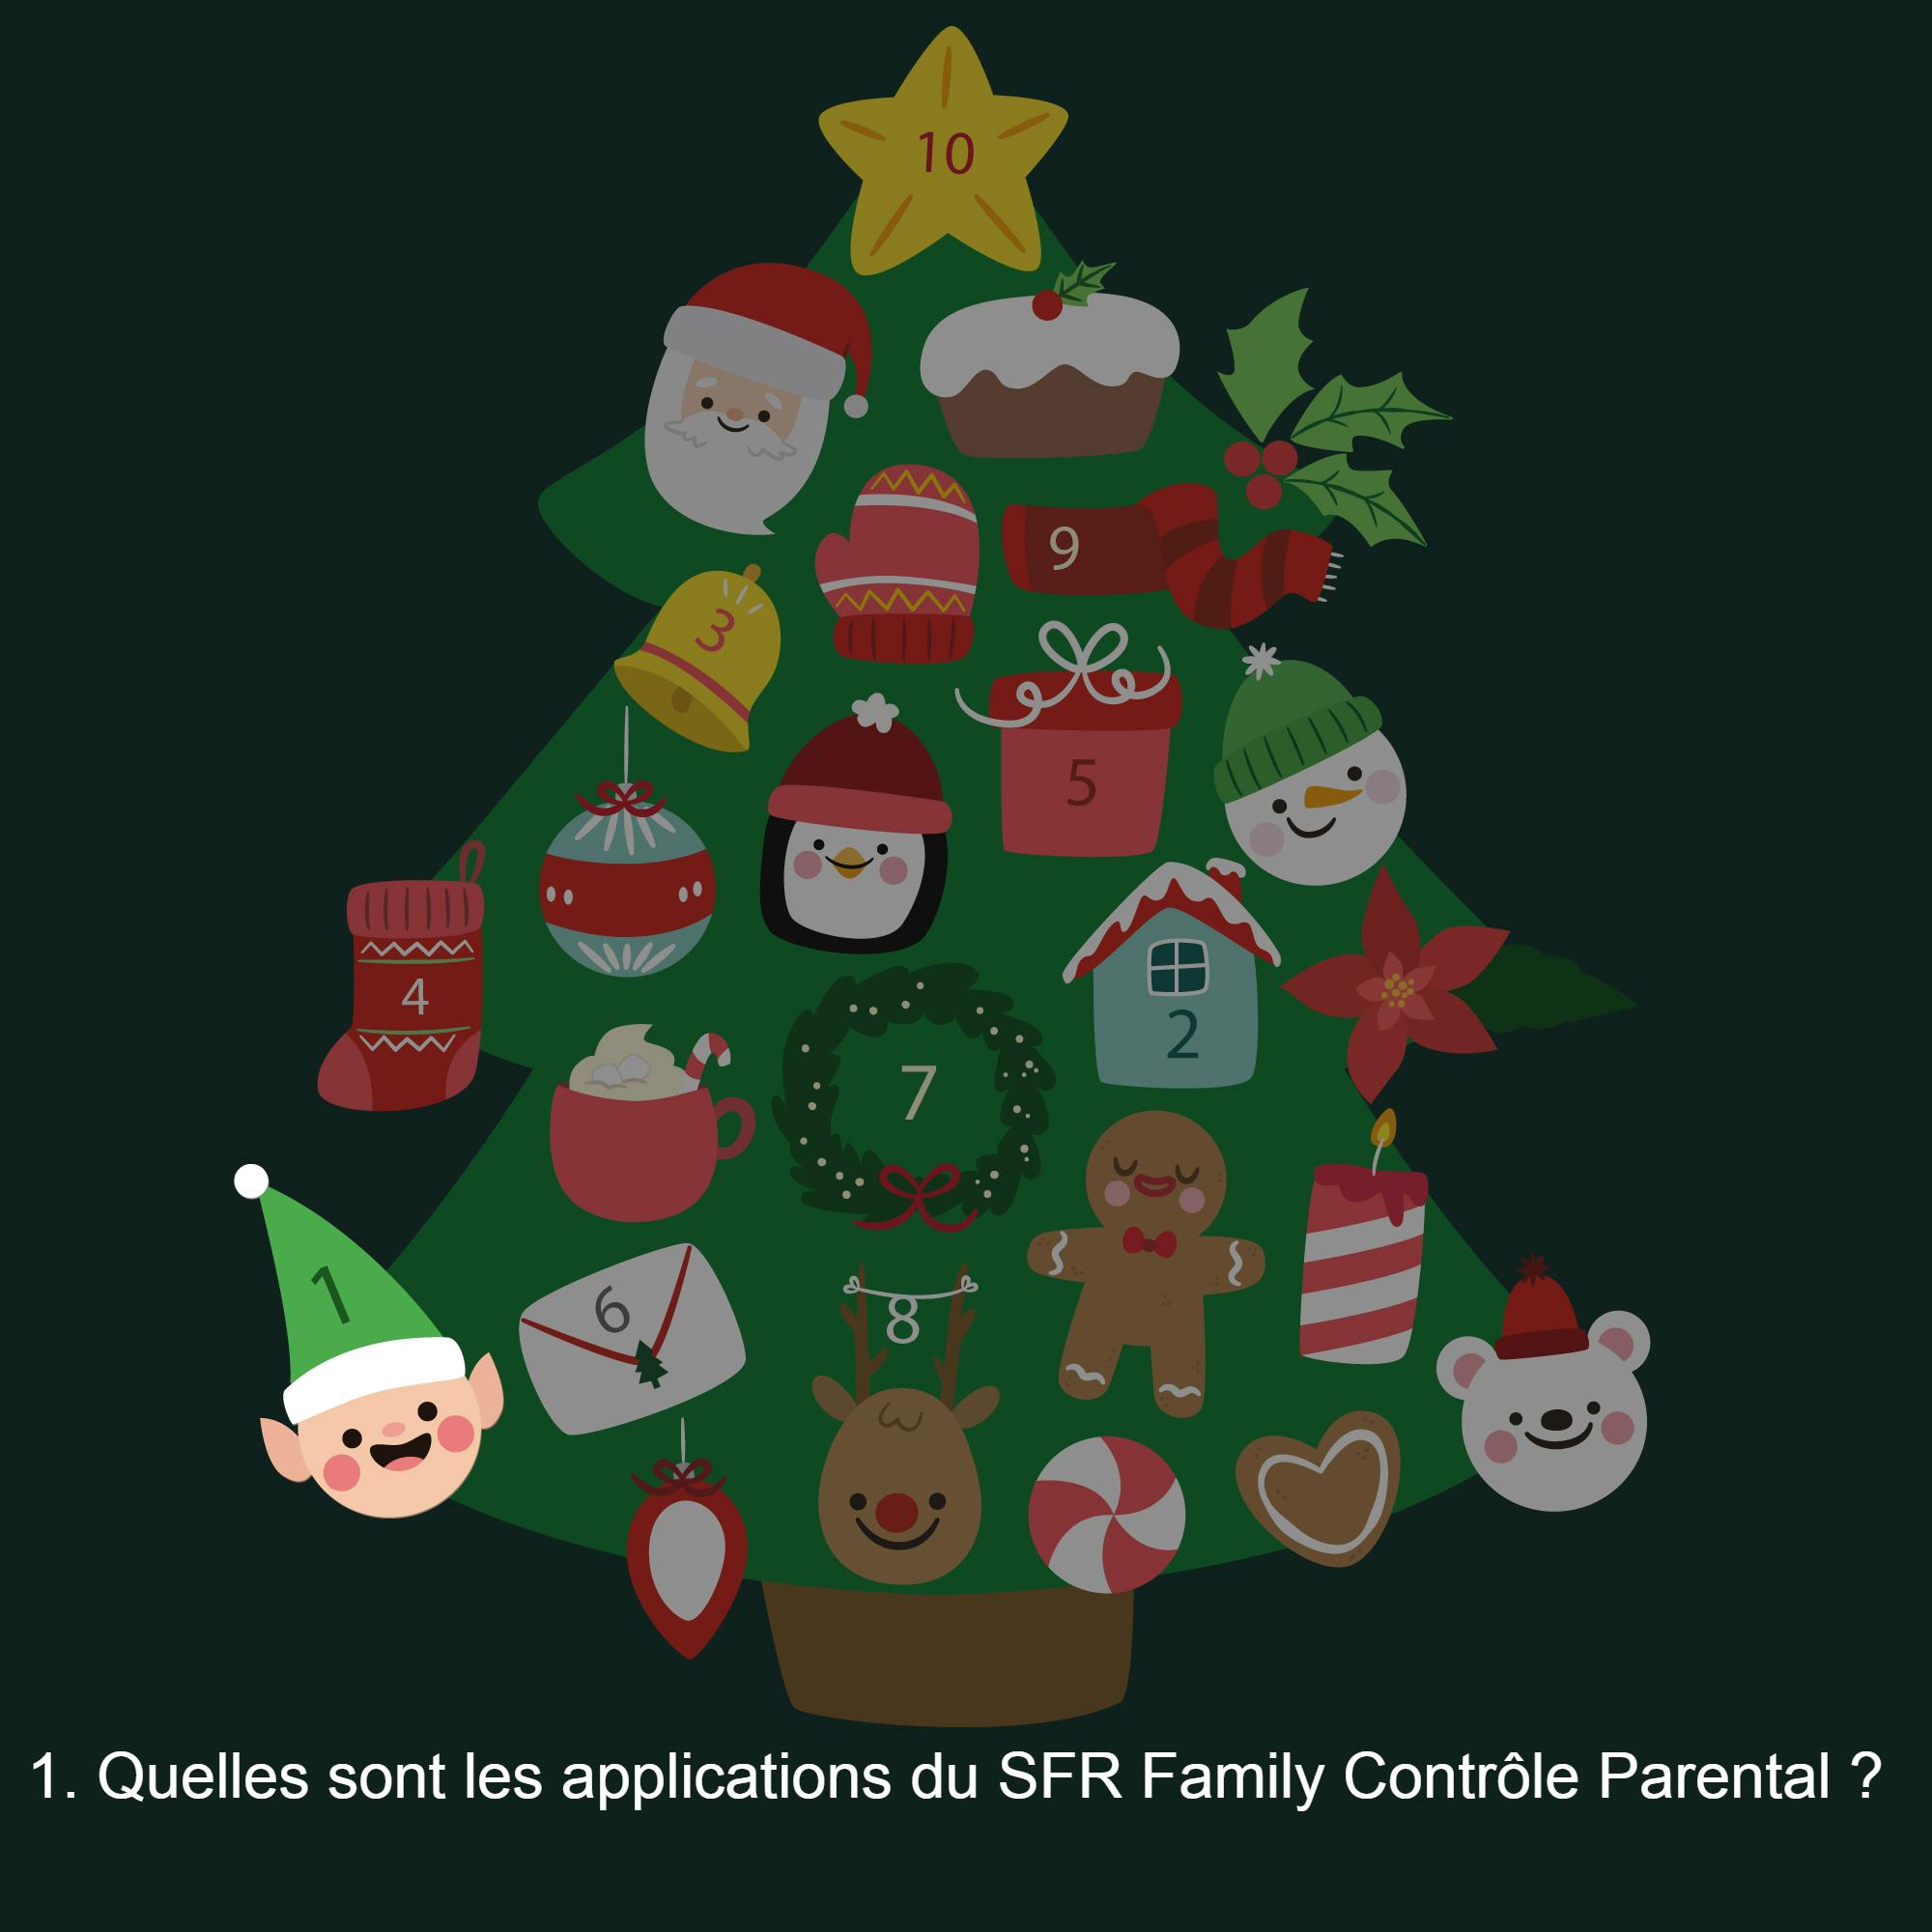 SFR_SFR-Le-noel-du-forum_19122018_TOPIC-jour-1_001#sfrclicid=F_topic_jeu-noel-2018-BOL.jpg